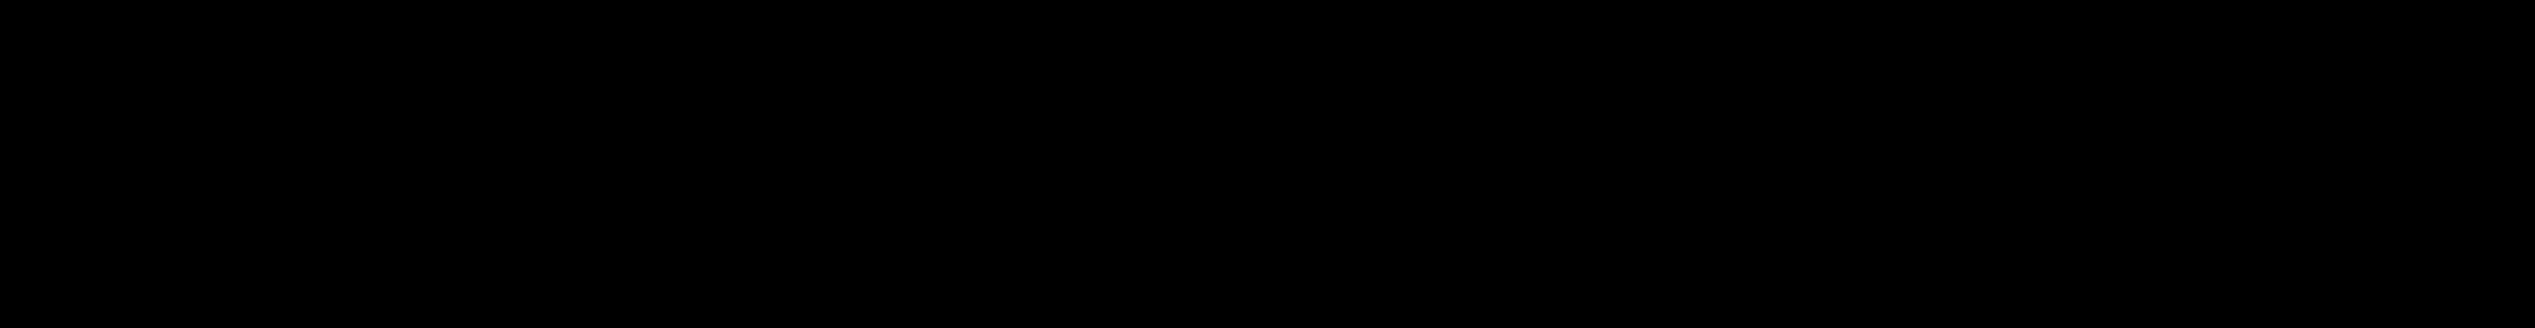 sponsor_image